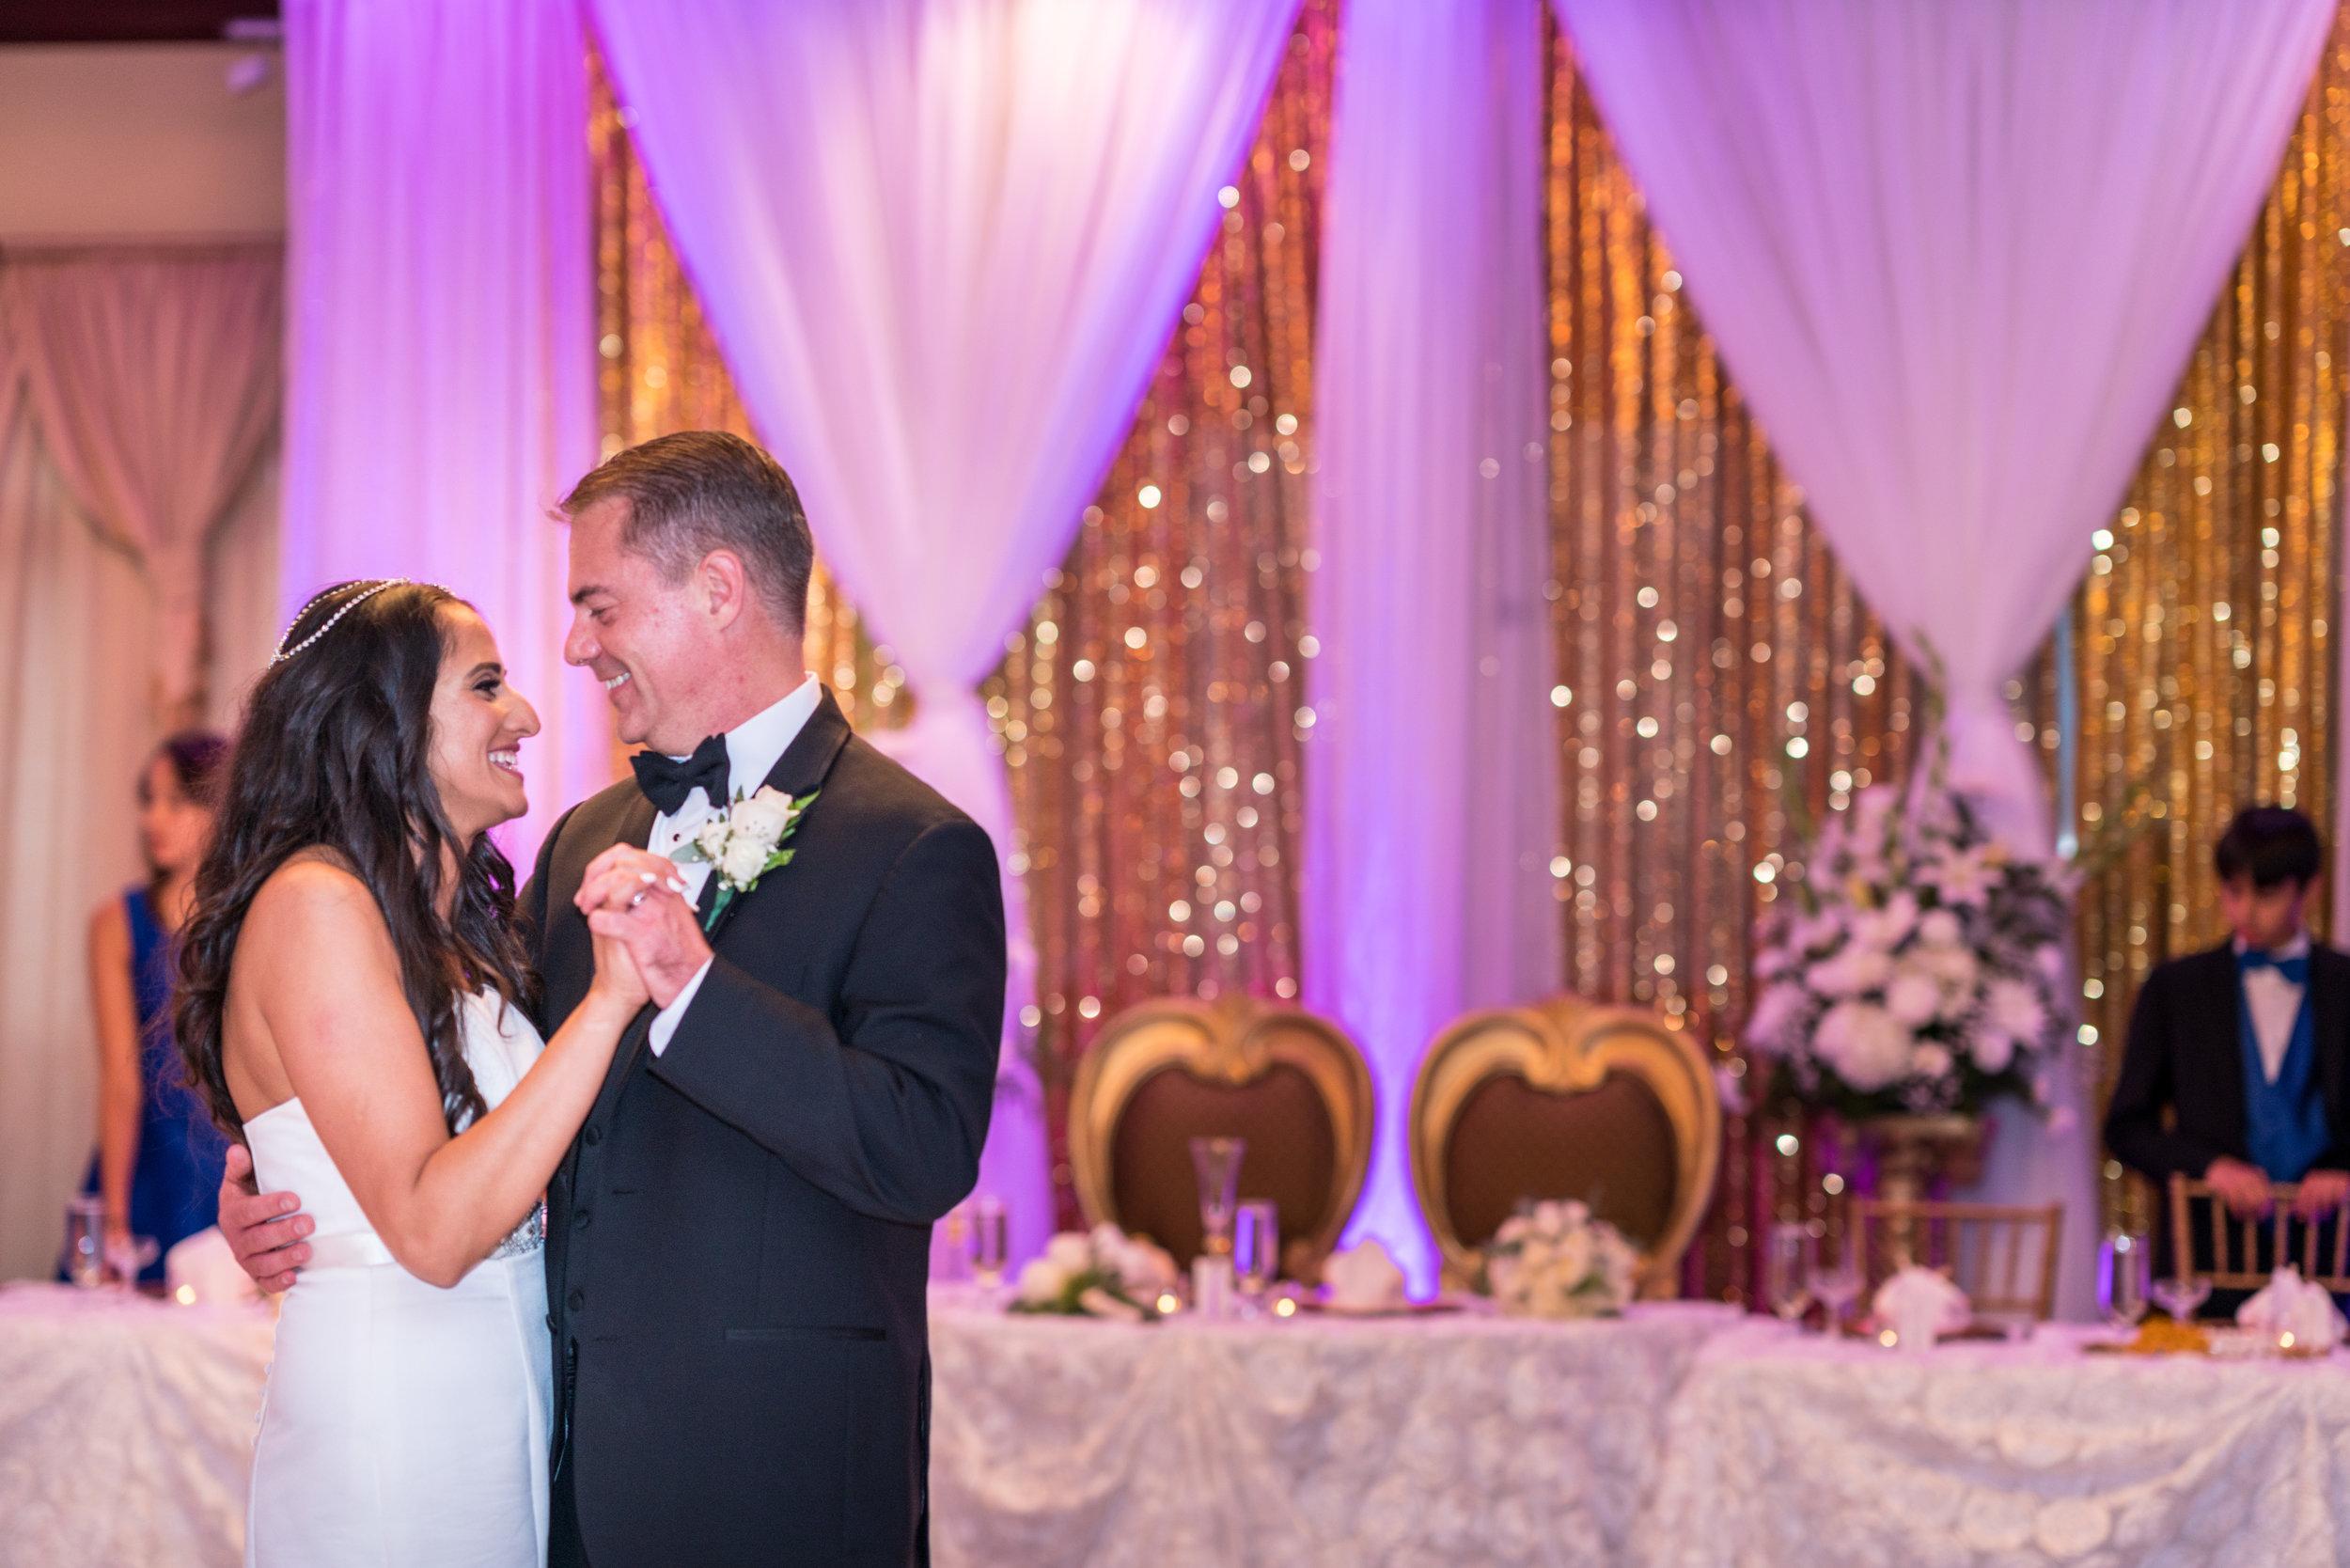 wedding-first-dance-lighting-tips.jpg